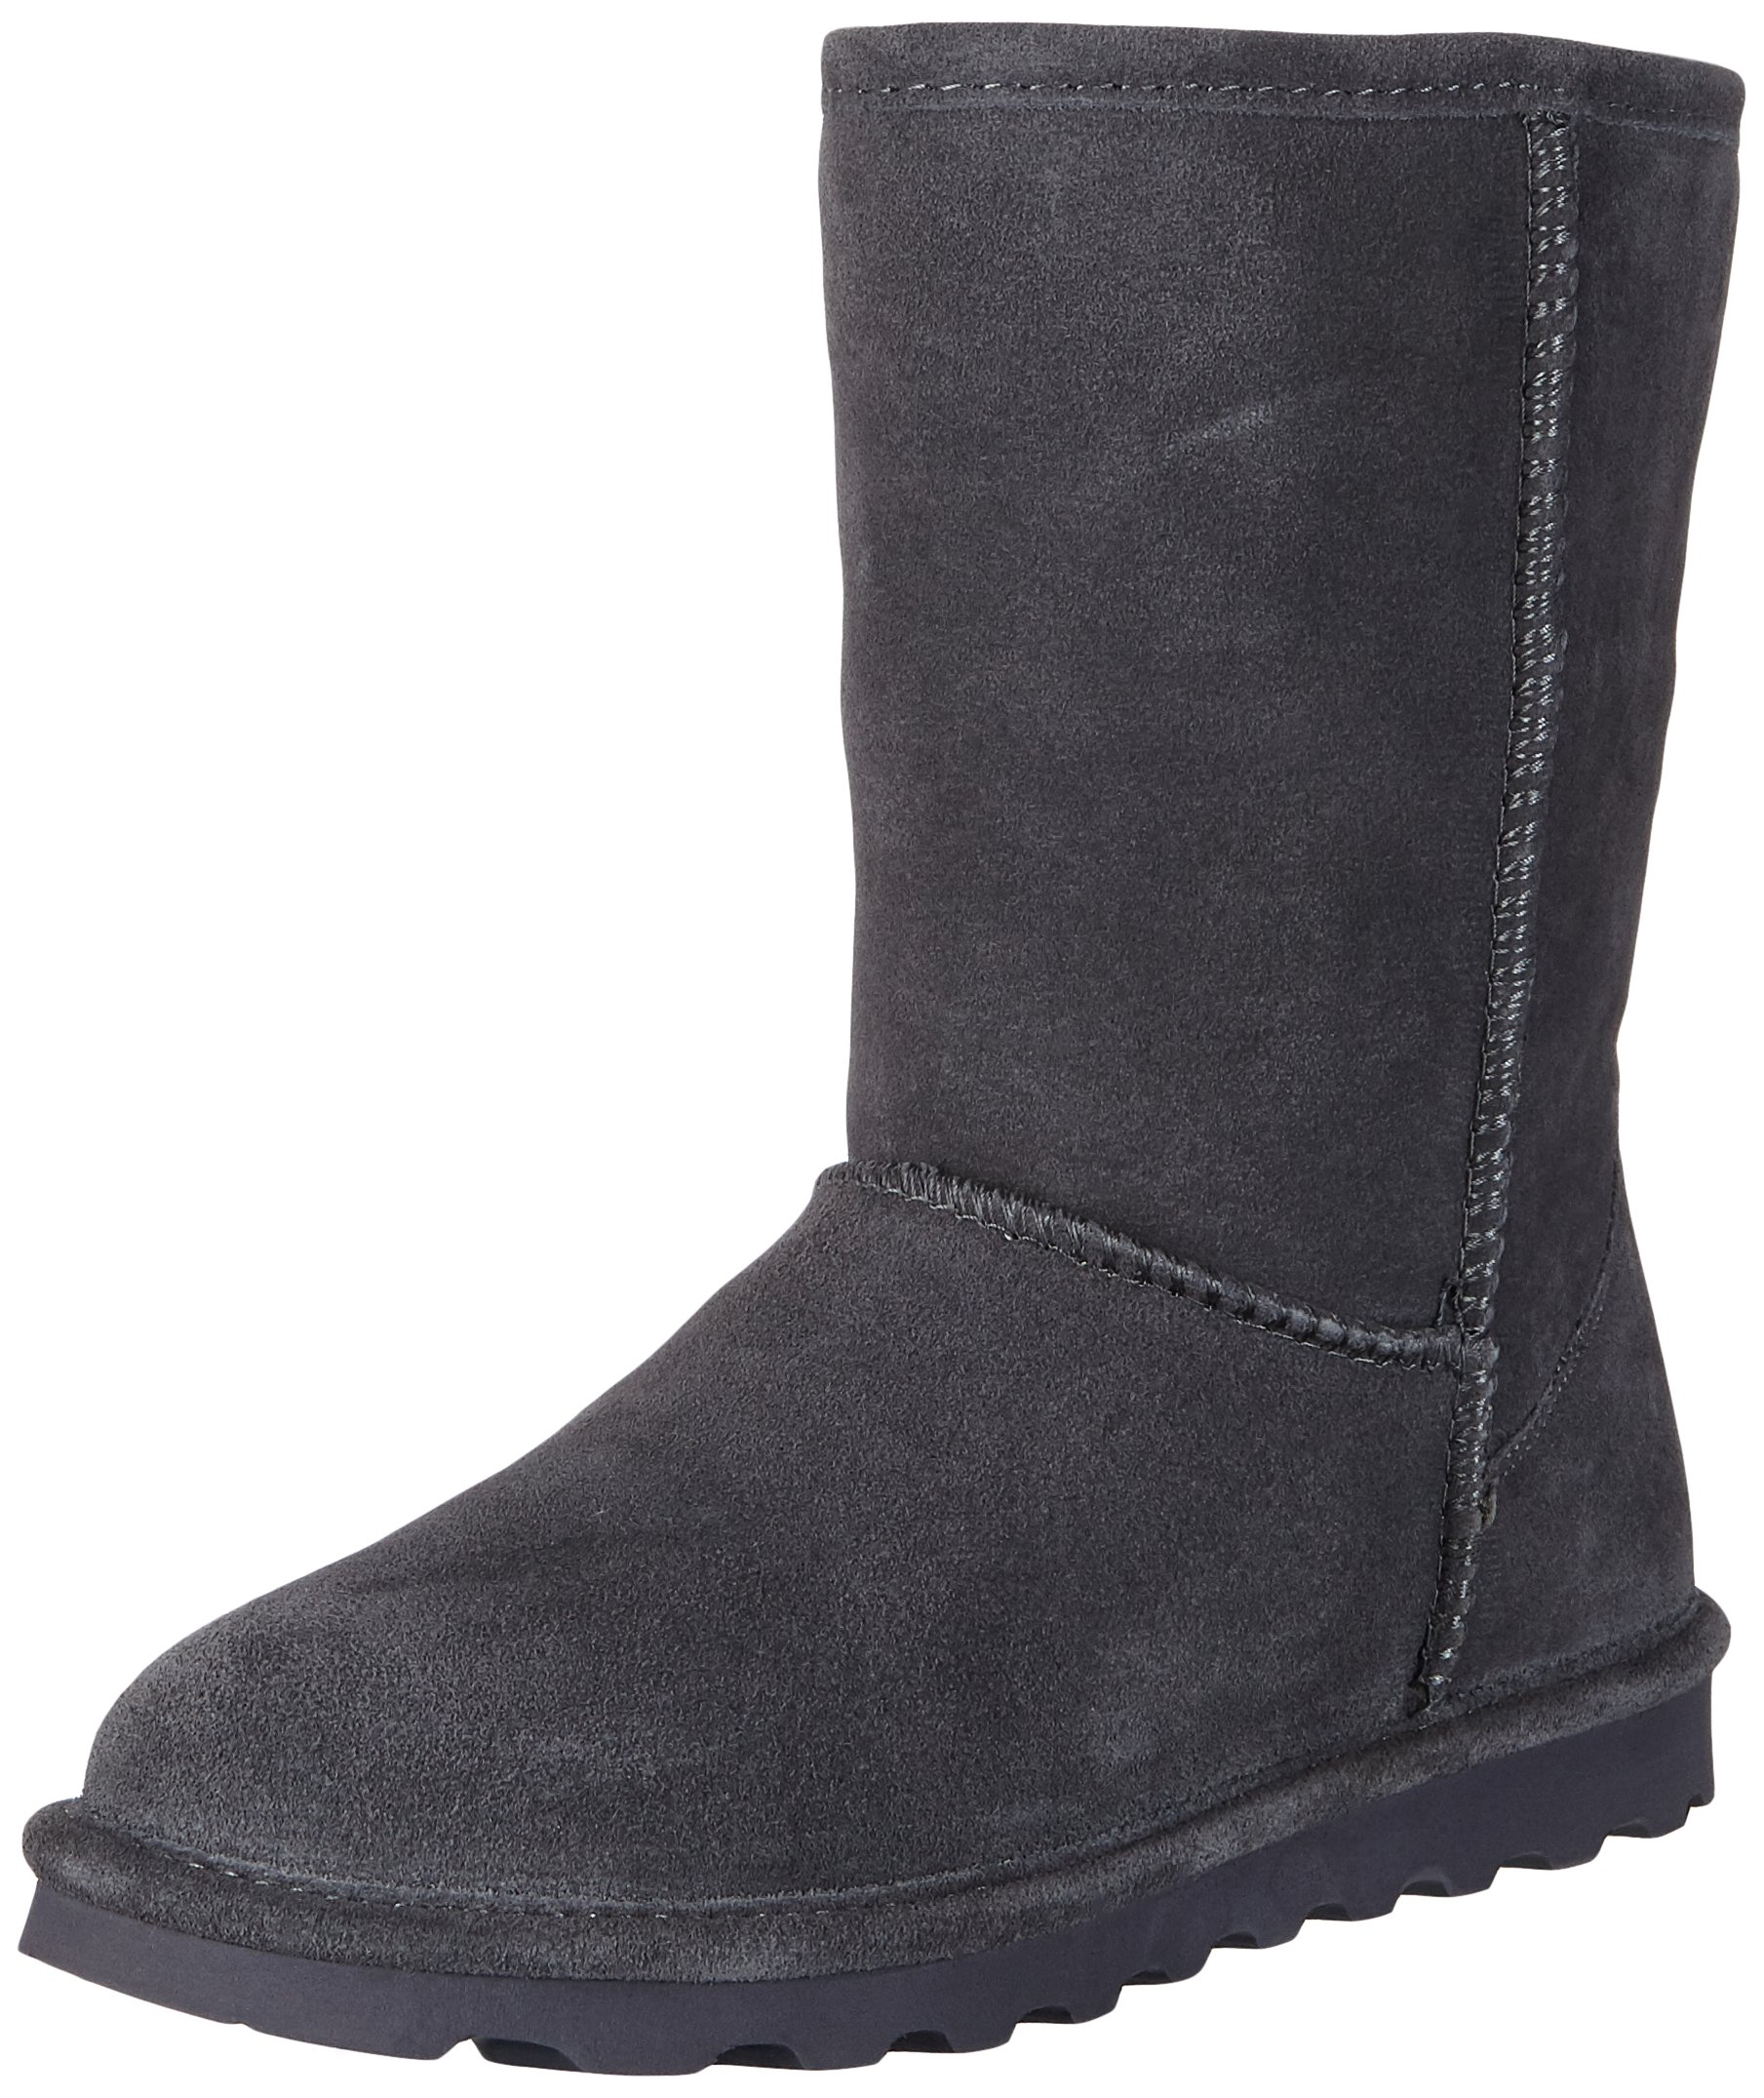 Bearpaw Elle Short Women Round Toe Suede Tan Winter Boot ,Charcoal, 9 B(M) US